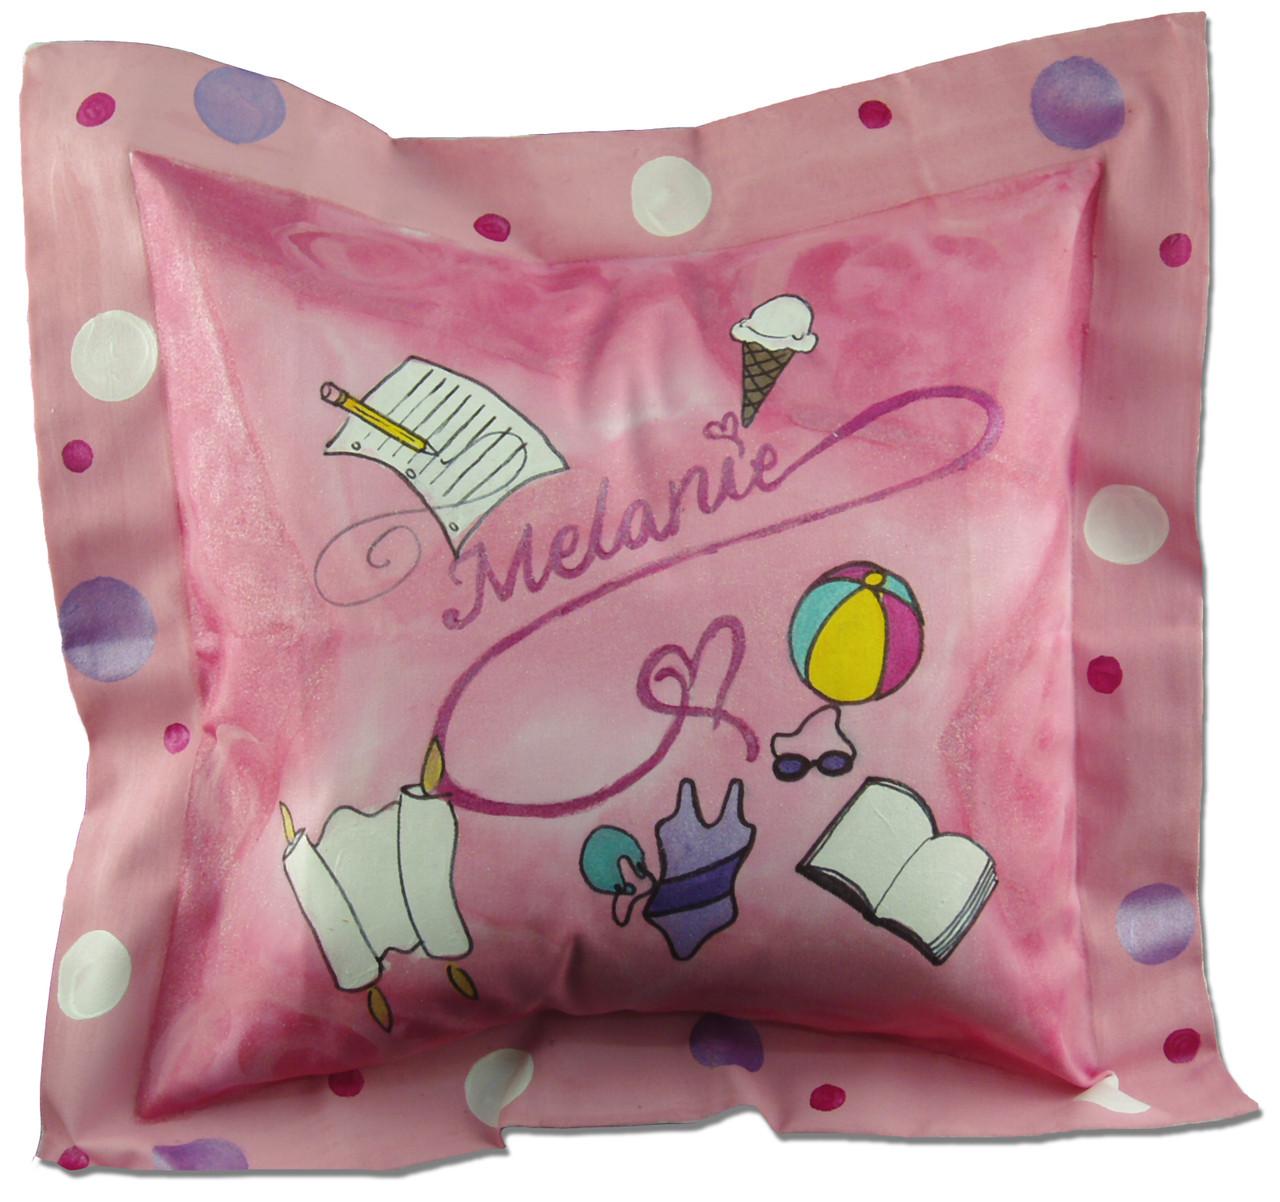 Hand painted Bat Mitzvah pillow with first name, Bat Mitzvah date and Torah portion, and recipient's hobbies